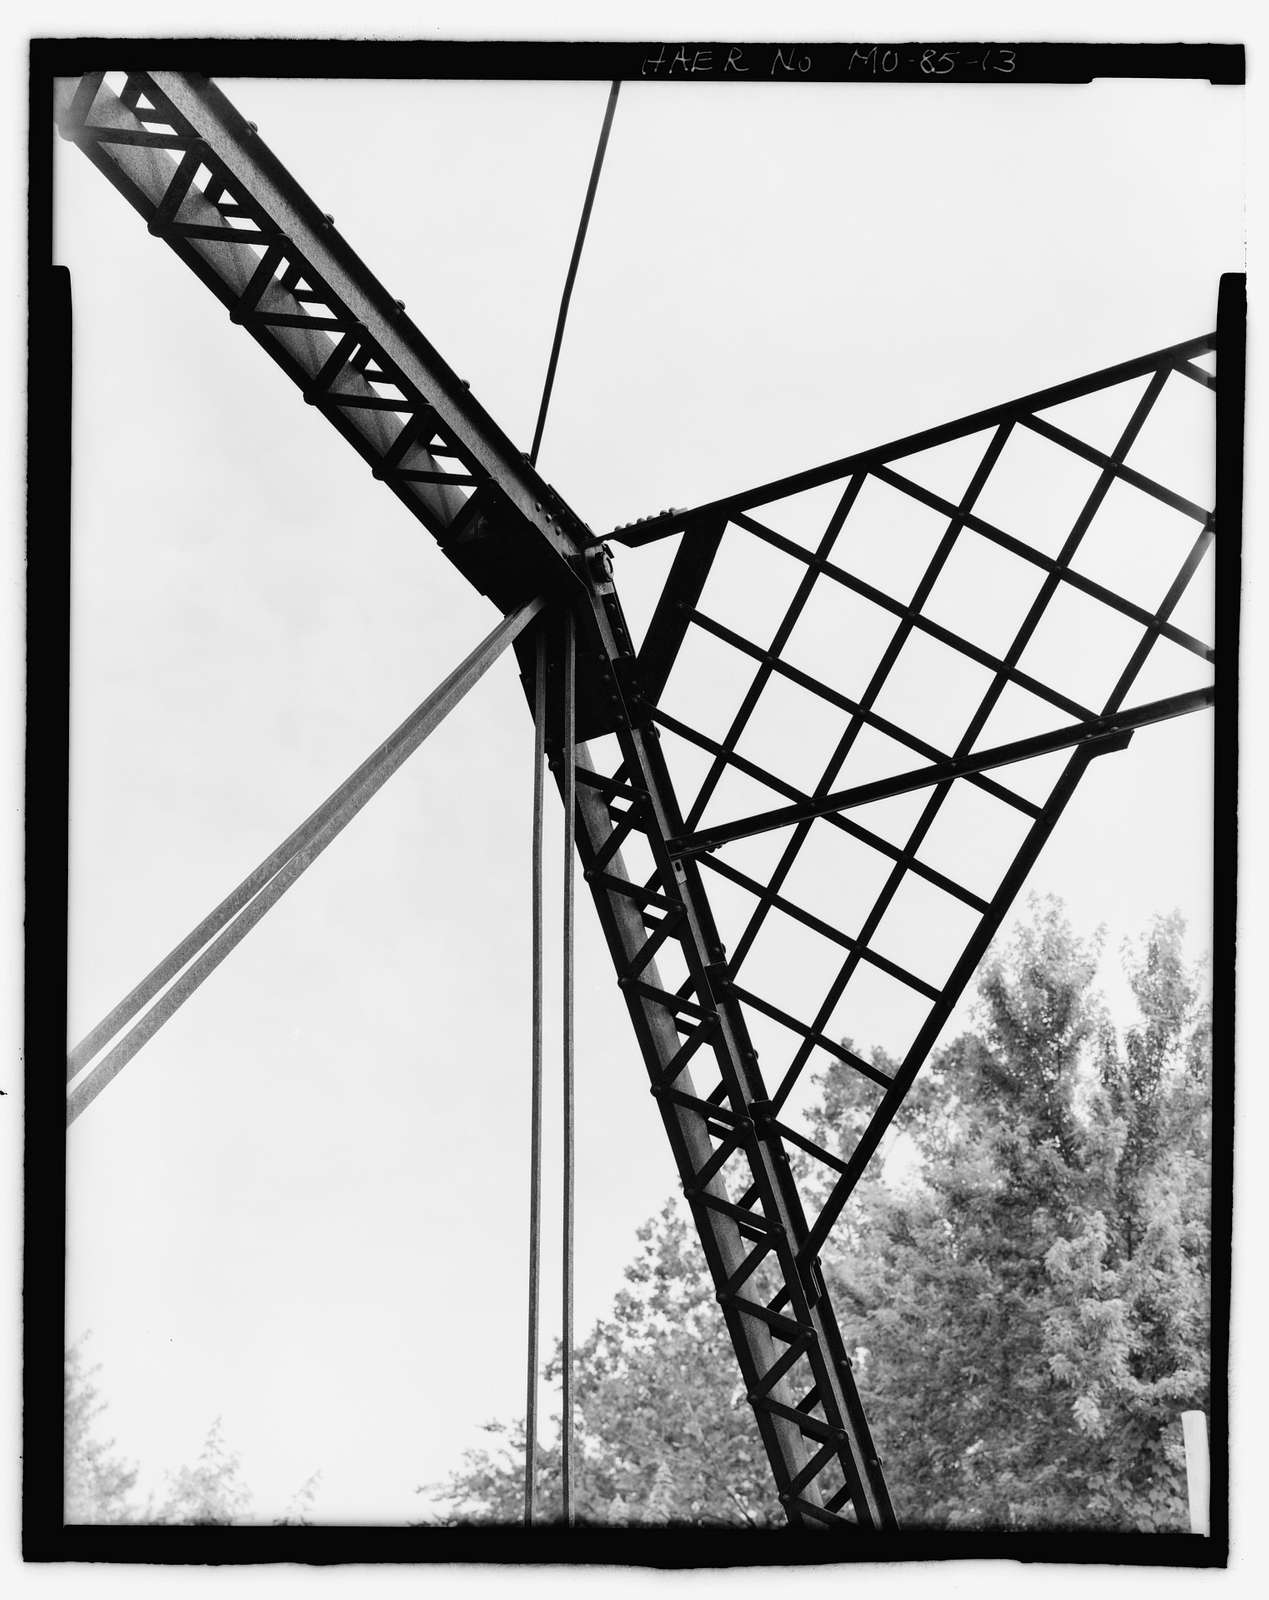 Lupus Bridge, Spanning Splice Creek at Moniteau County Road 4, Lupus, Moniteau County, MO